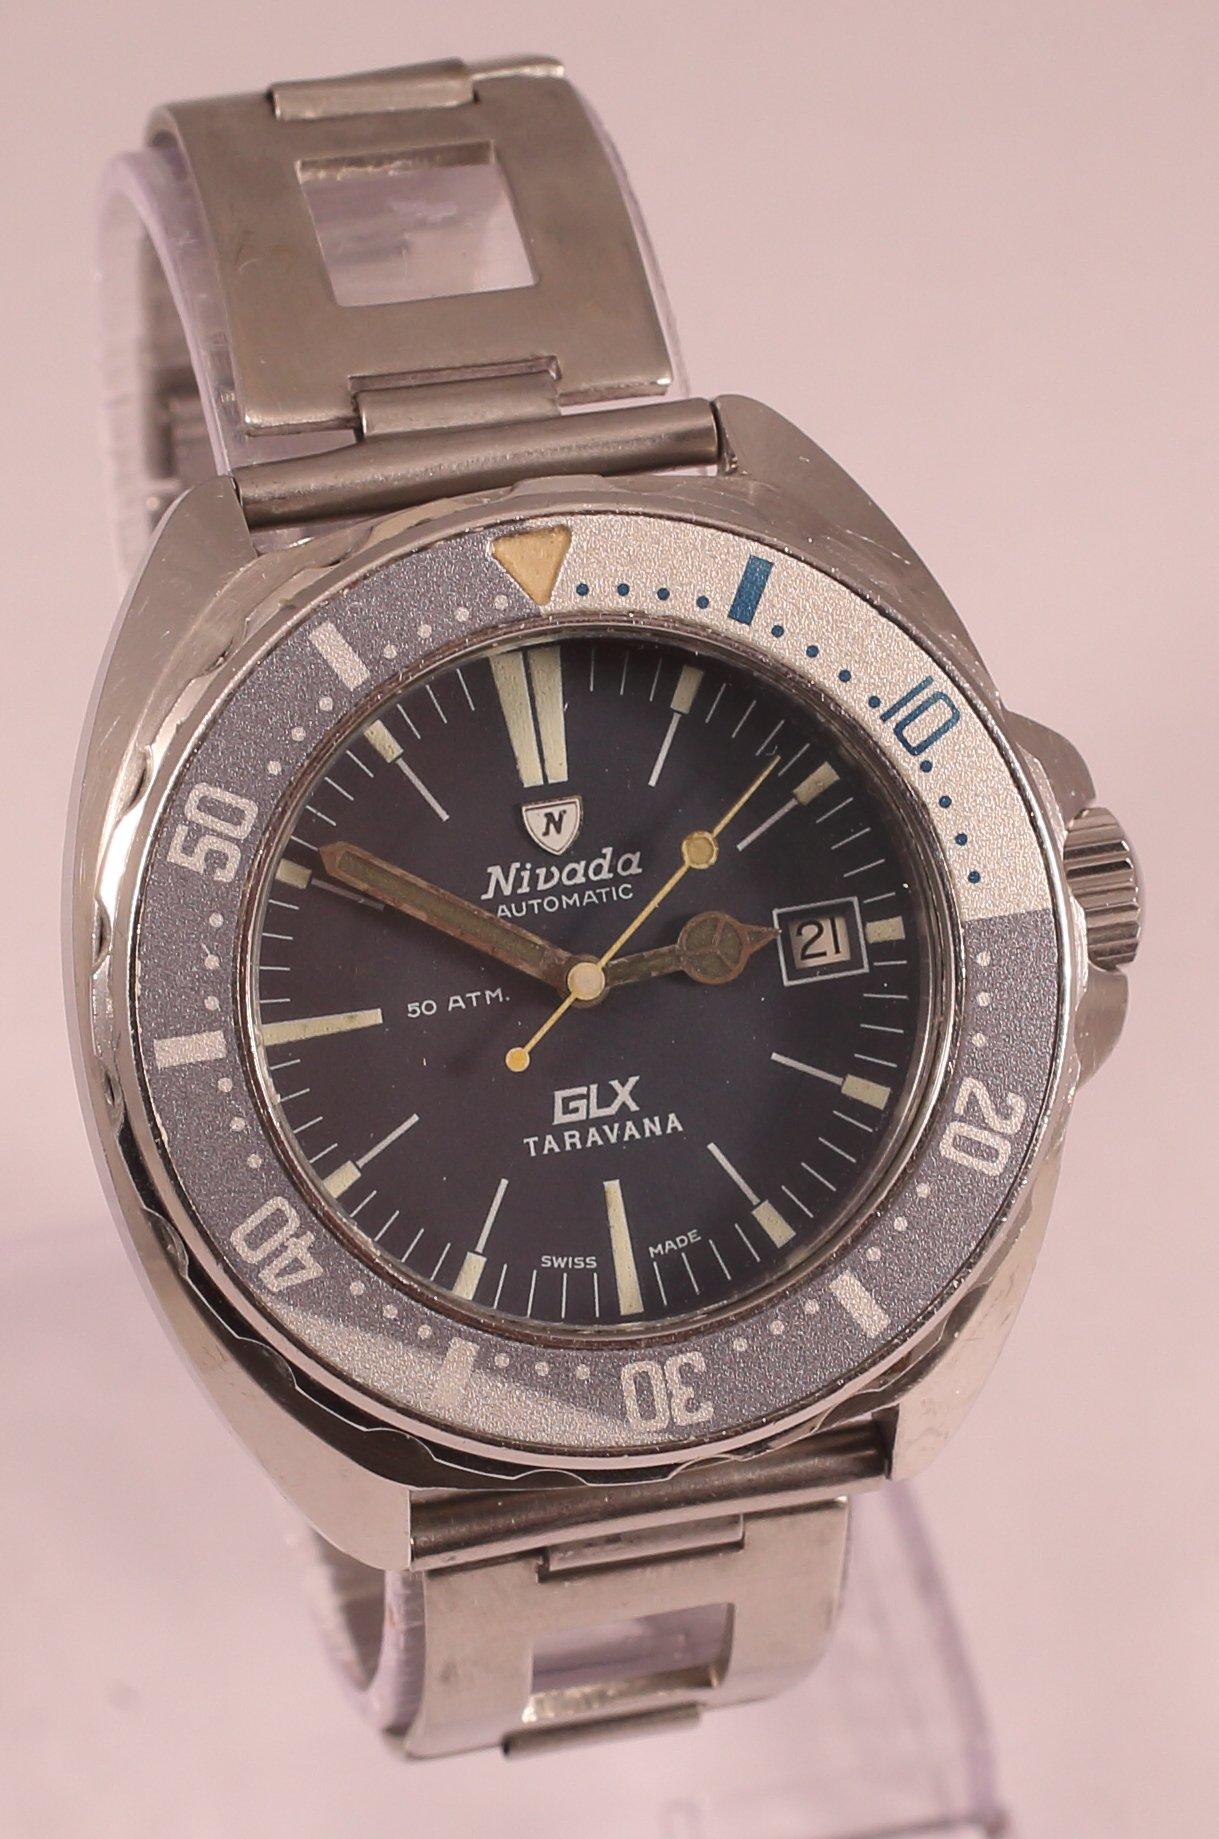 Rare Nivada Glx Taravana 50atm Automatic Diver S Watch On Clewco Rally Bracelet Watchuseek Watch Forums